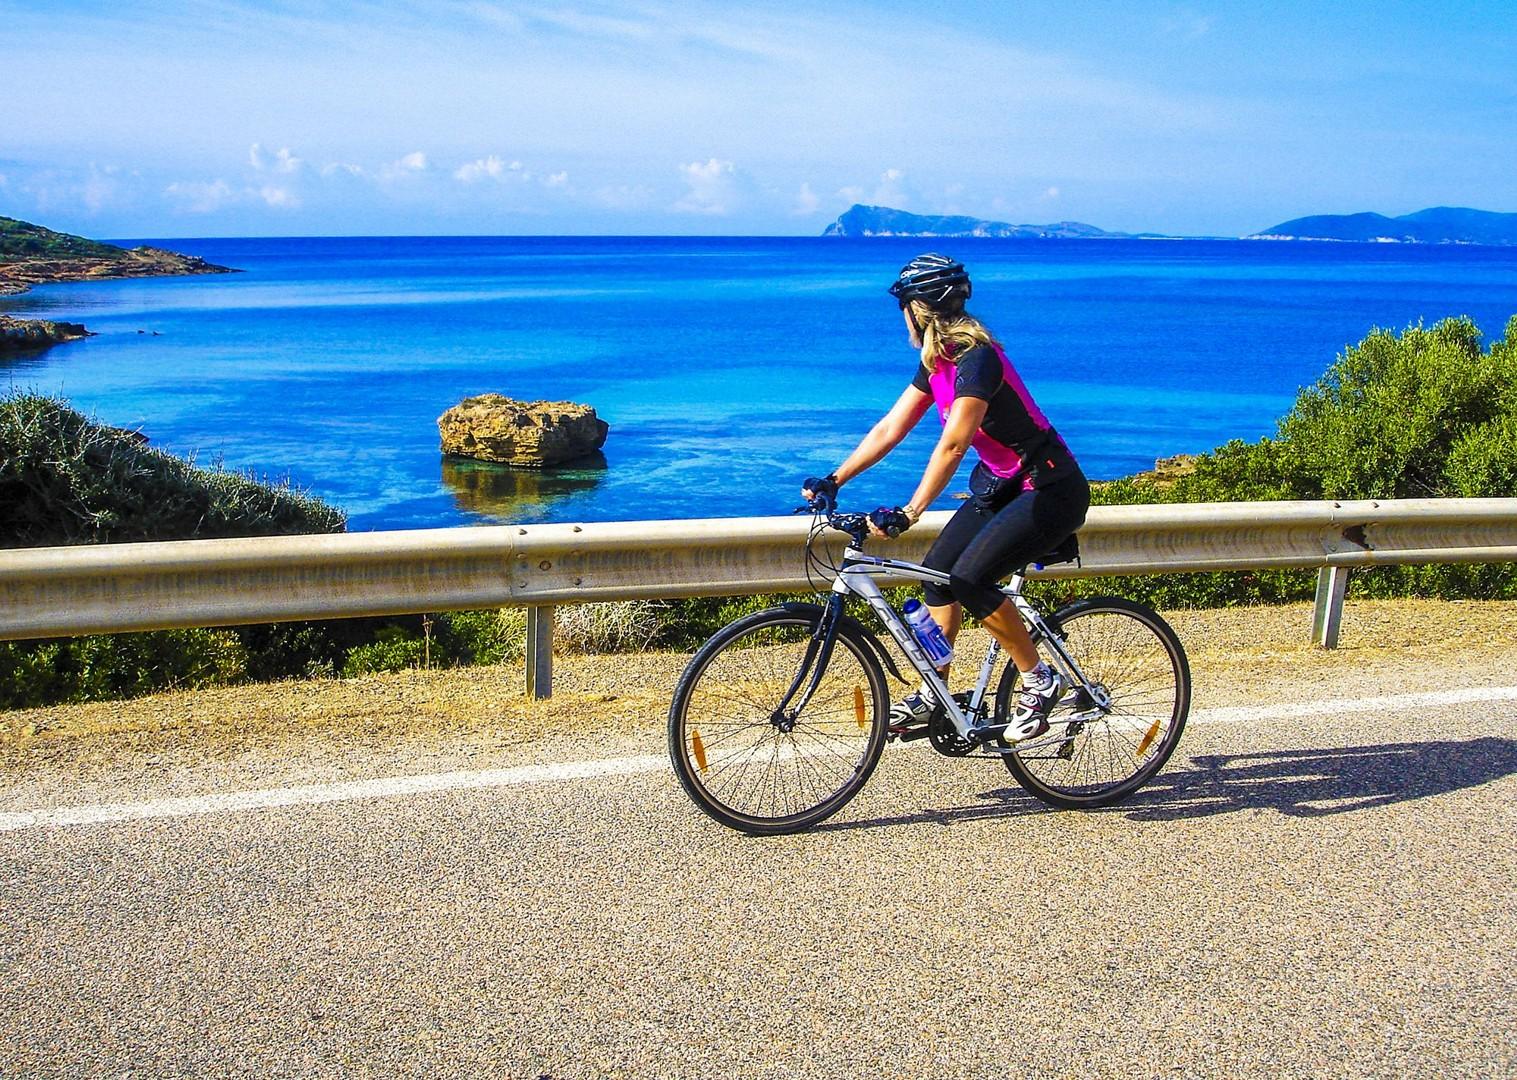 fdfsdfsdfsdfsdfsdf2.jpg - Italy - Sardinia - Island Flavours - Guided Leisure Cycling Holiday - Leisure Cycling